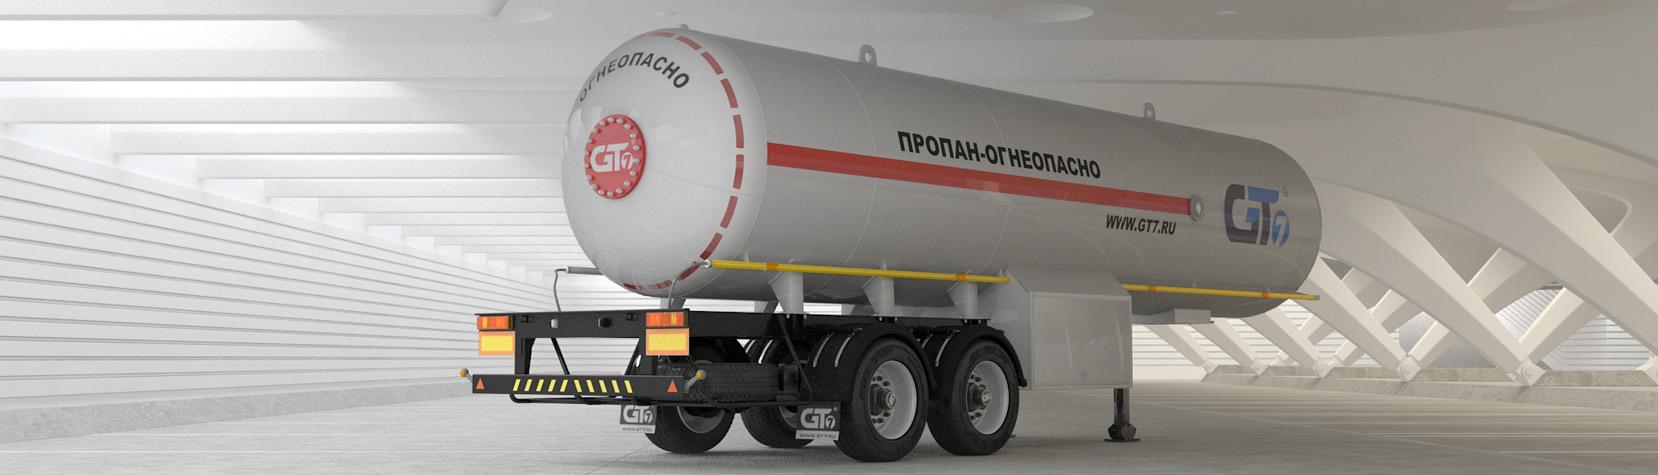 gazovoz-gt7-02-1